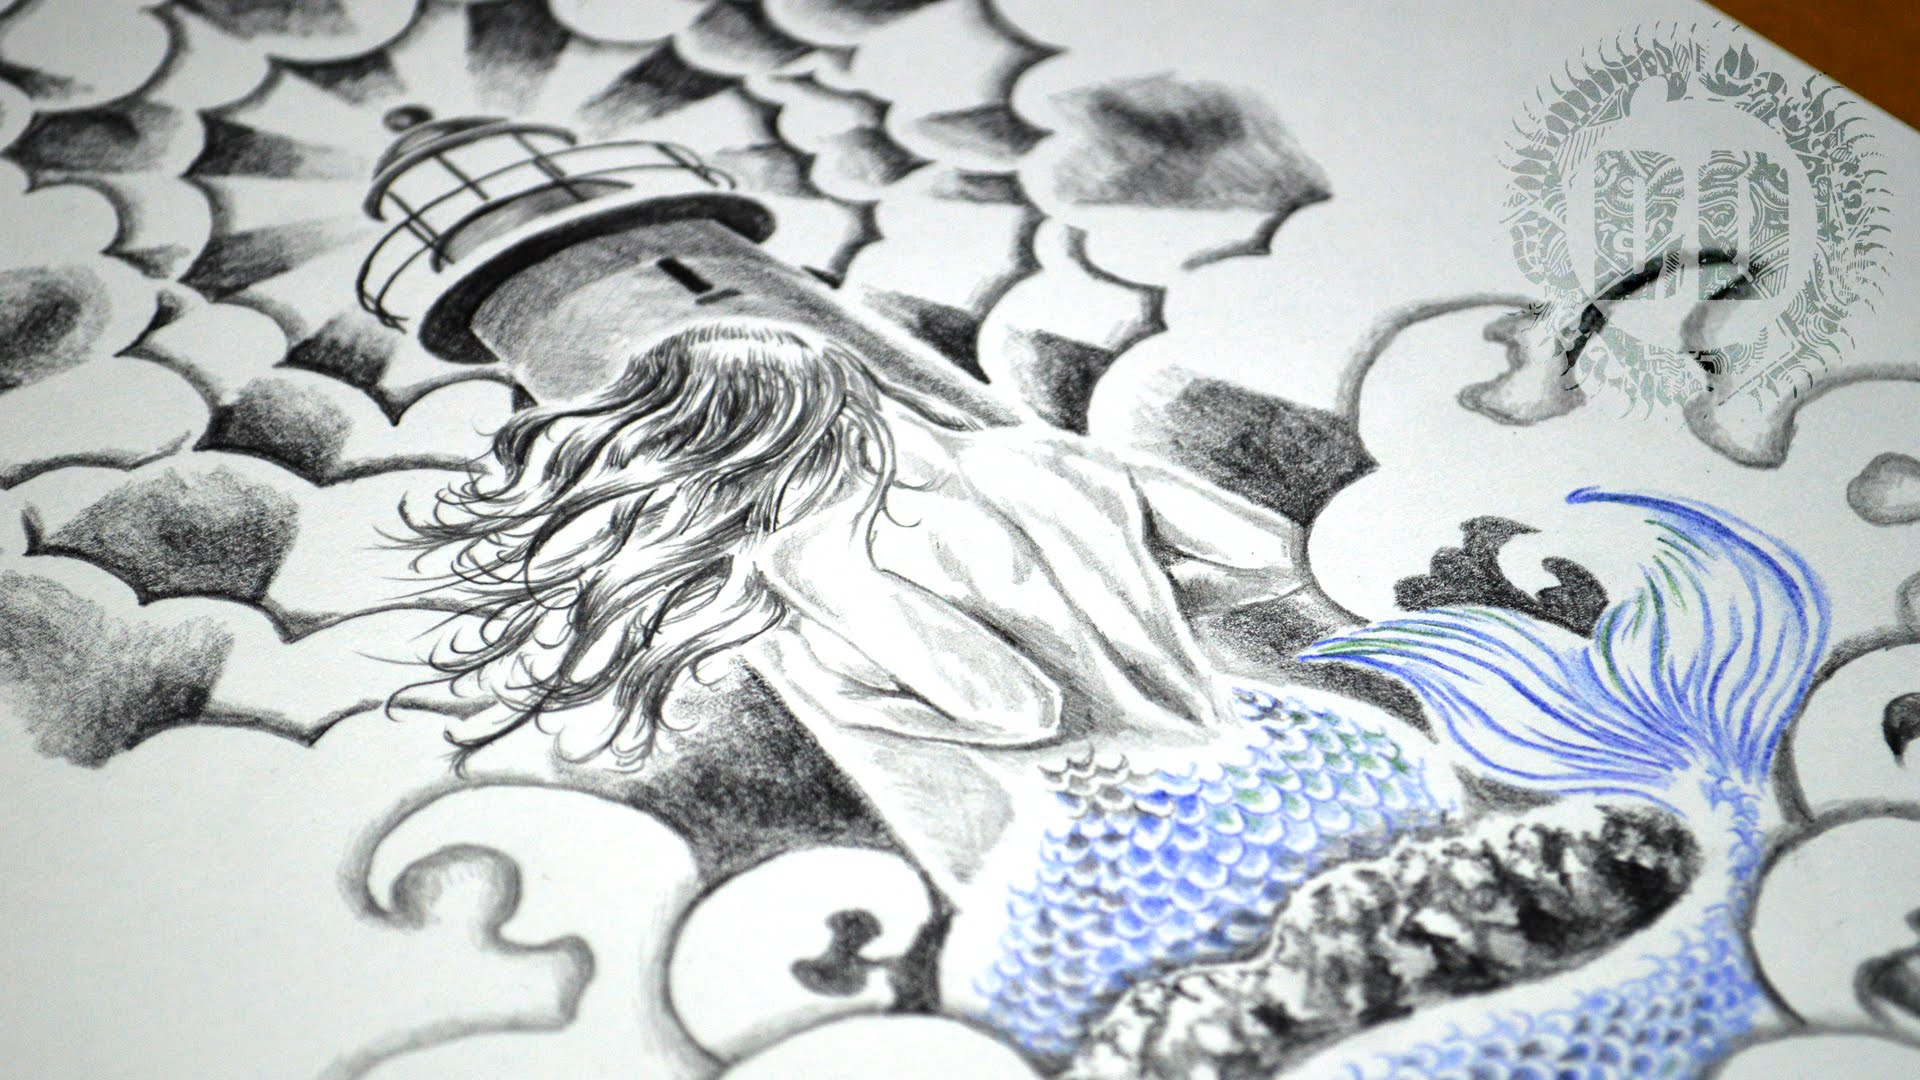 1920x1080 Mermaid Amp Lighthouse Tattoo Design